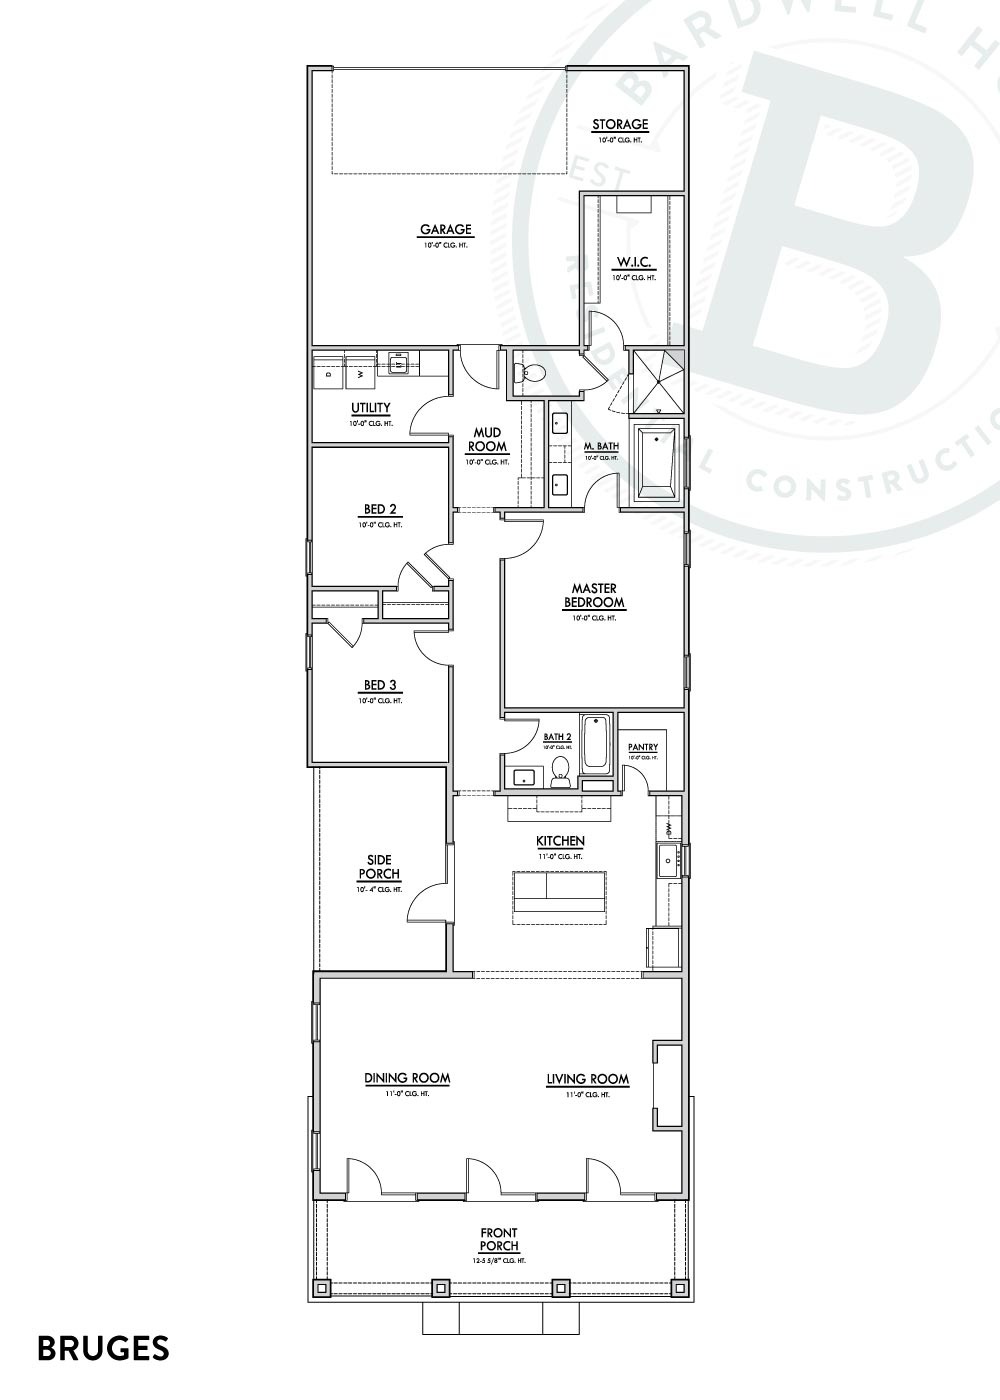 Bruges B Floorplan